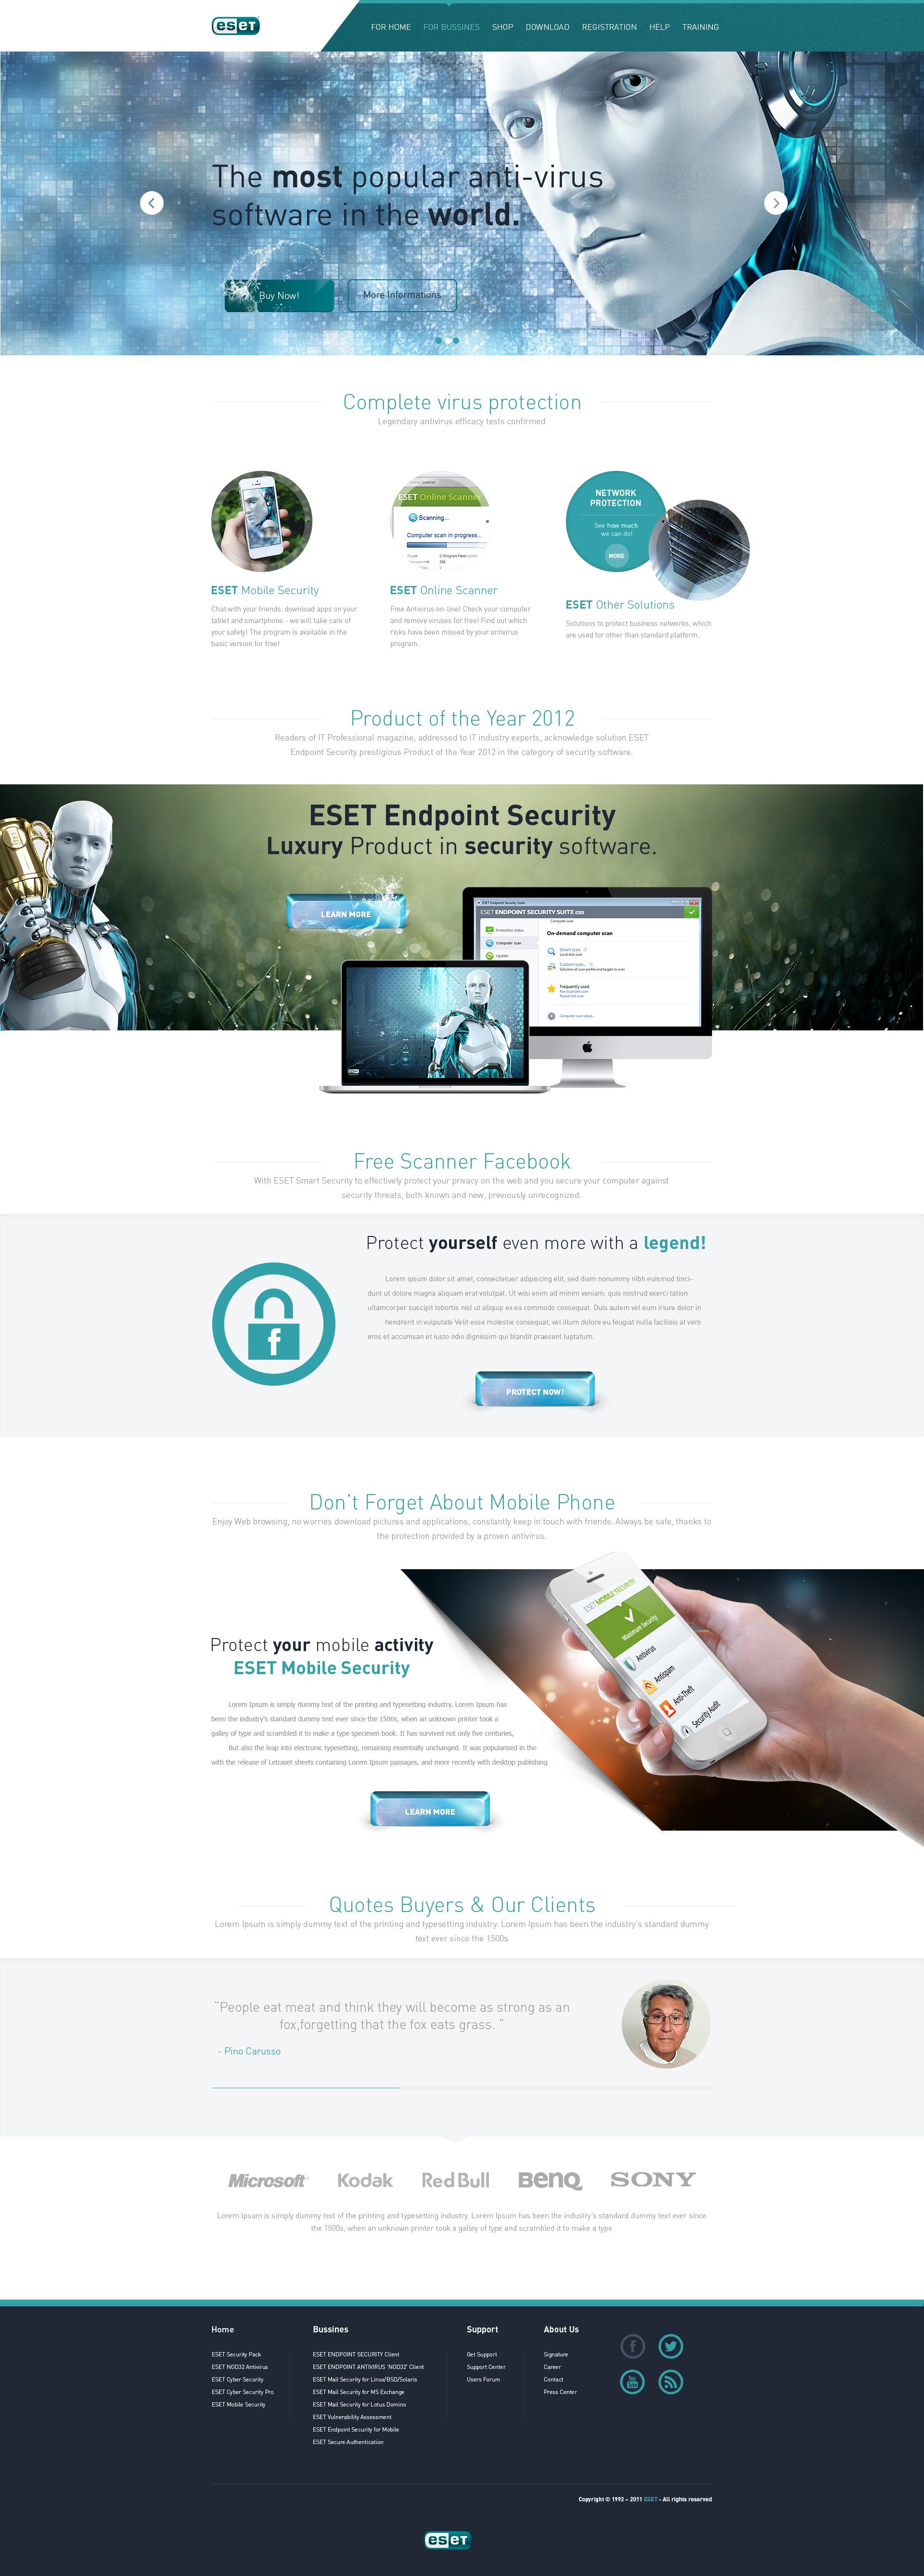 ESET AntiVirus - For Sale! by trkwebdesign